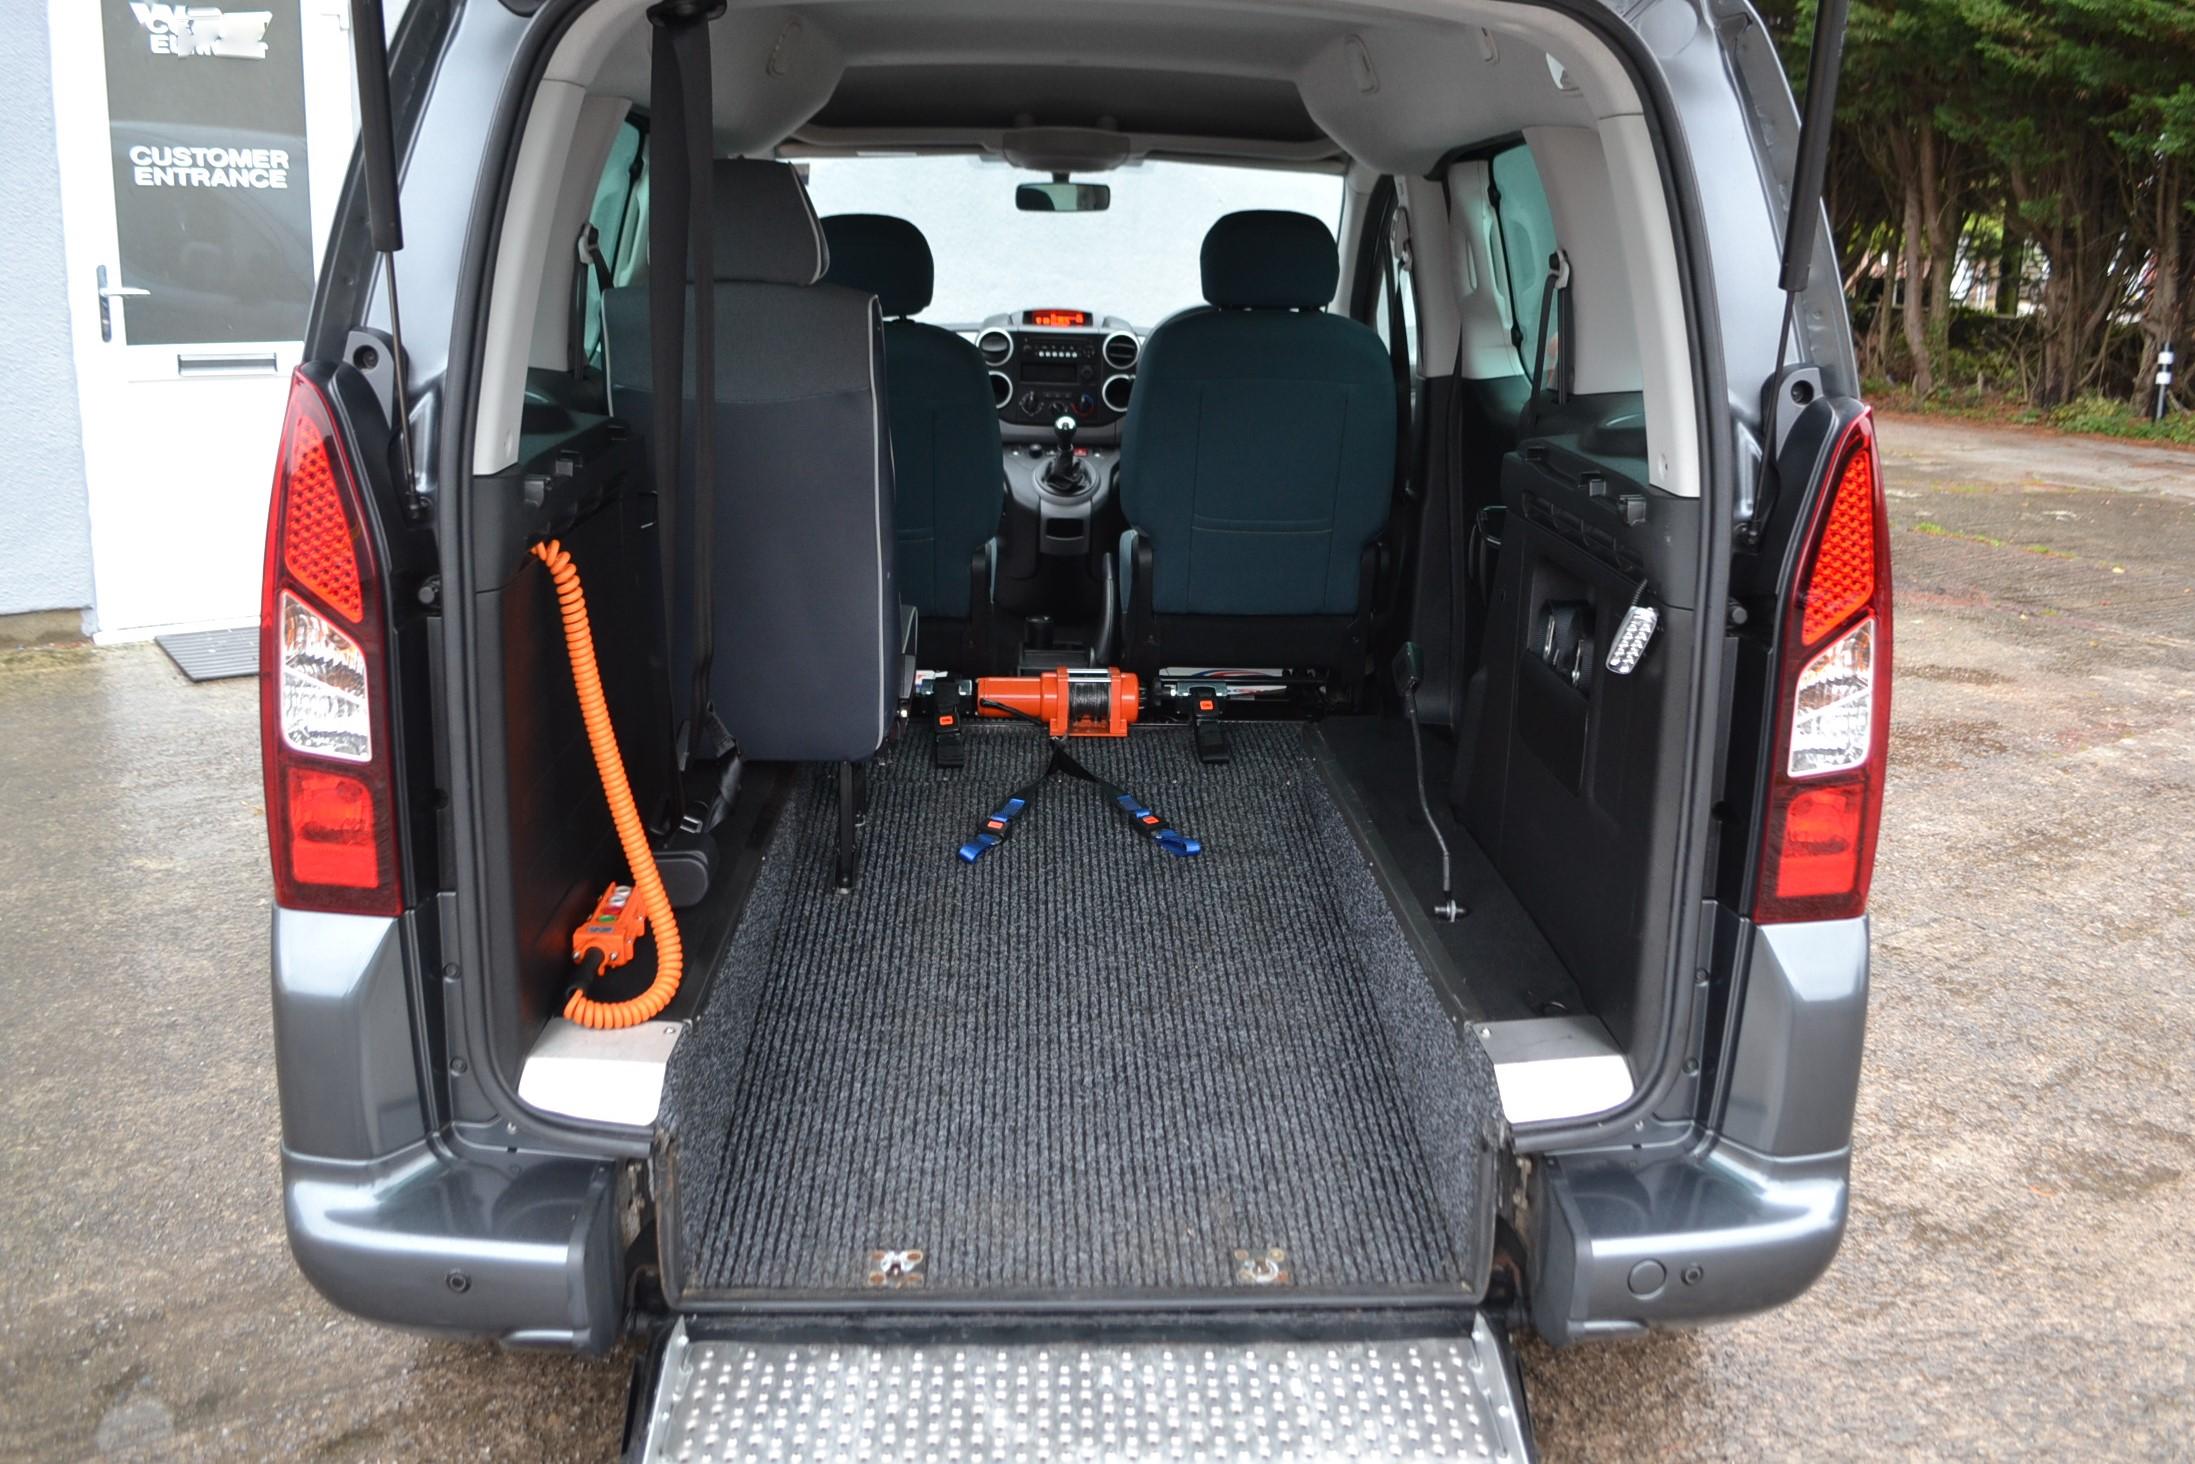 Wheelchair Accessible Vehicles WAV Cars Bristol Bath Swindon Devon Dorset - Electric Ramp